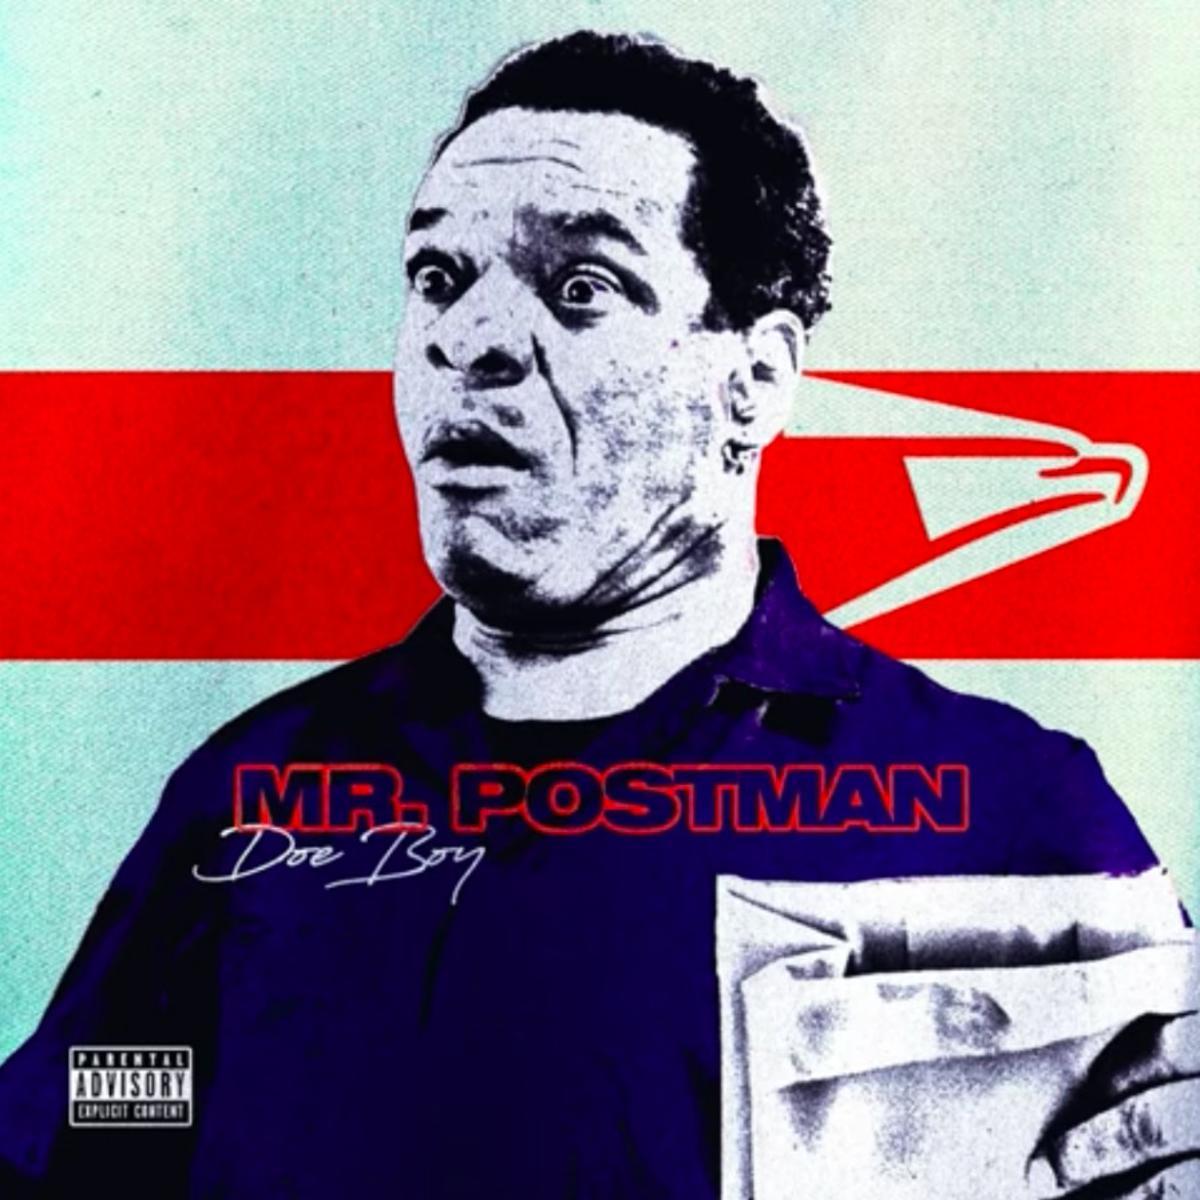 MP3: Doe Boy - Mr. Postman